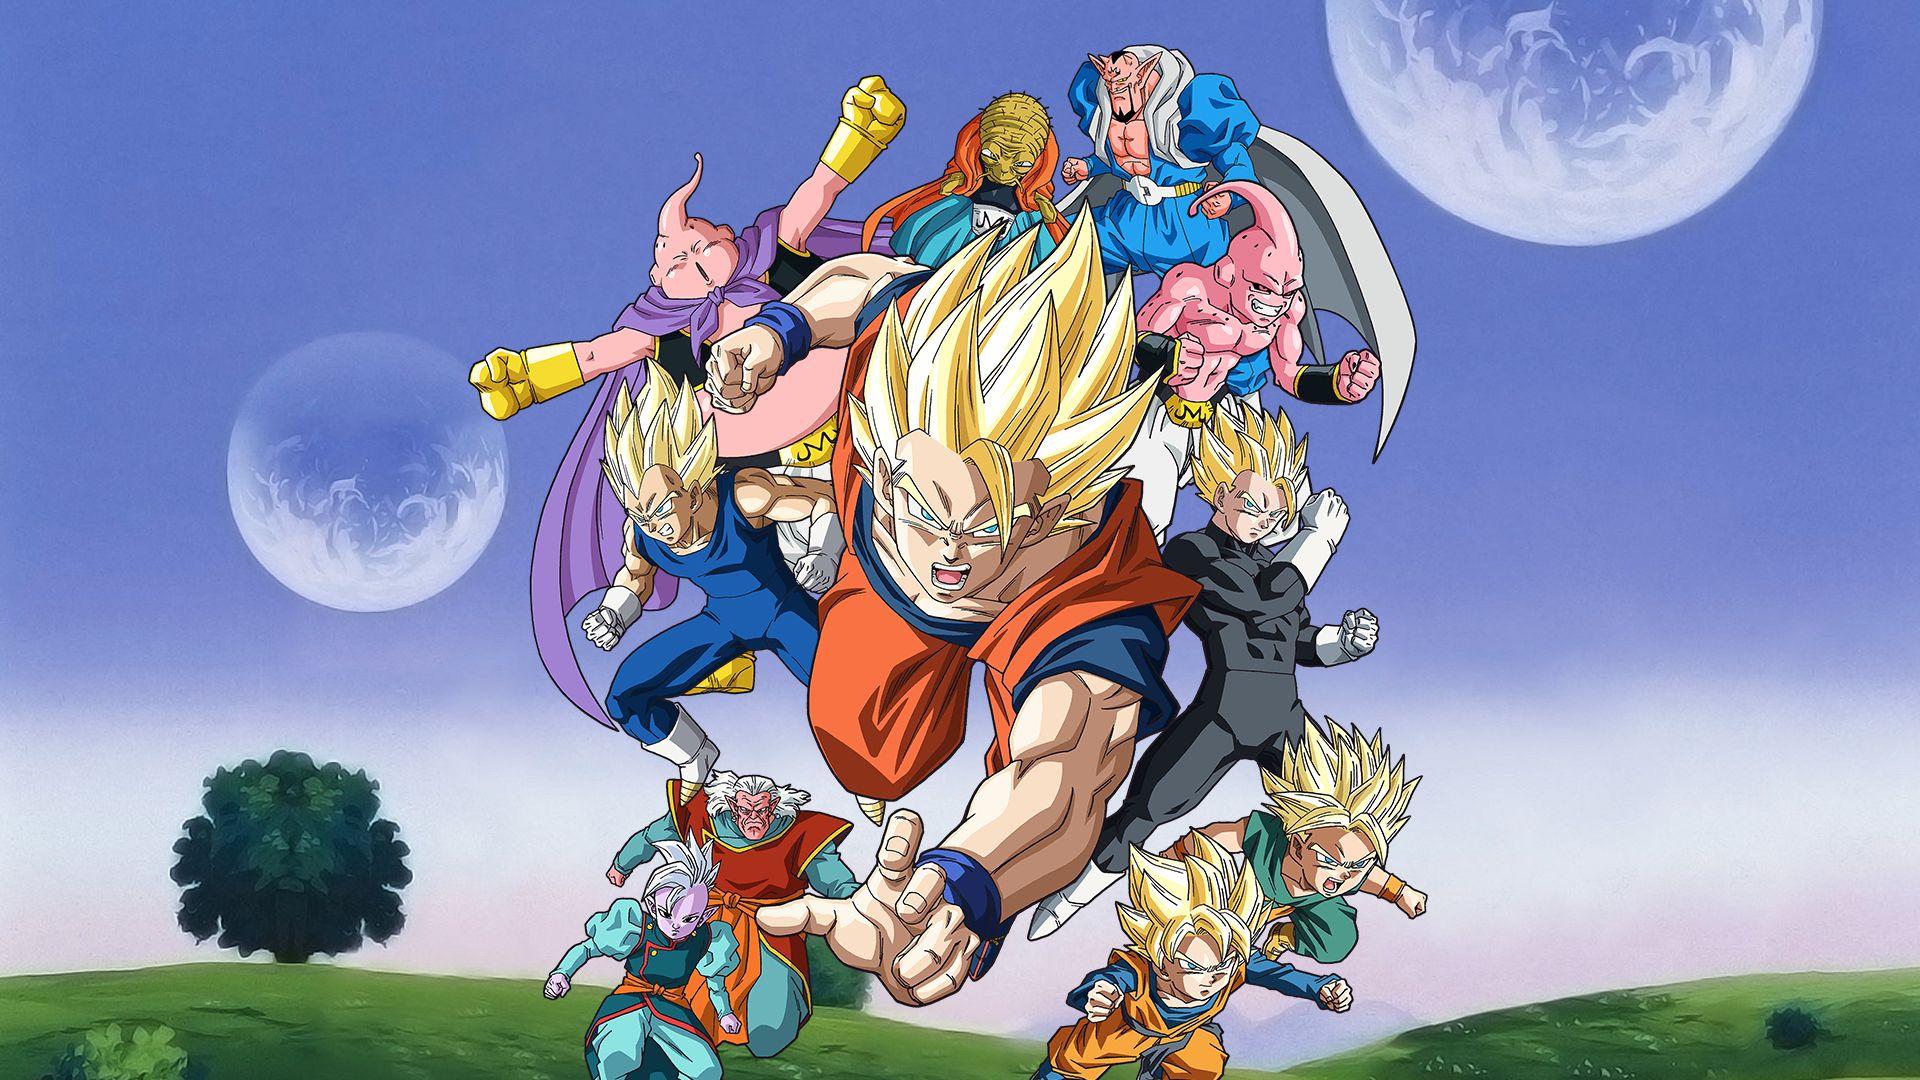 Dragon Ball Super Cover Photo Hd Wallpaper